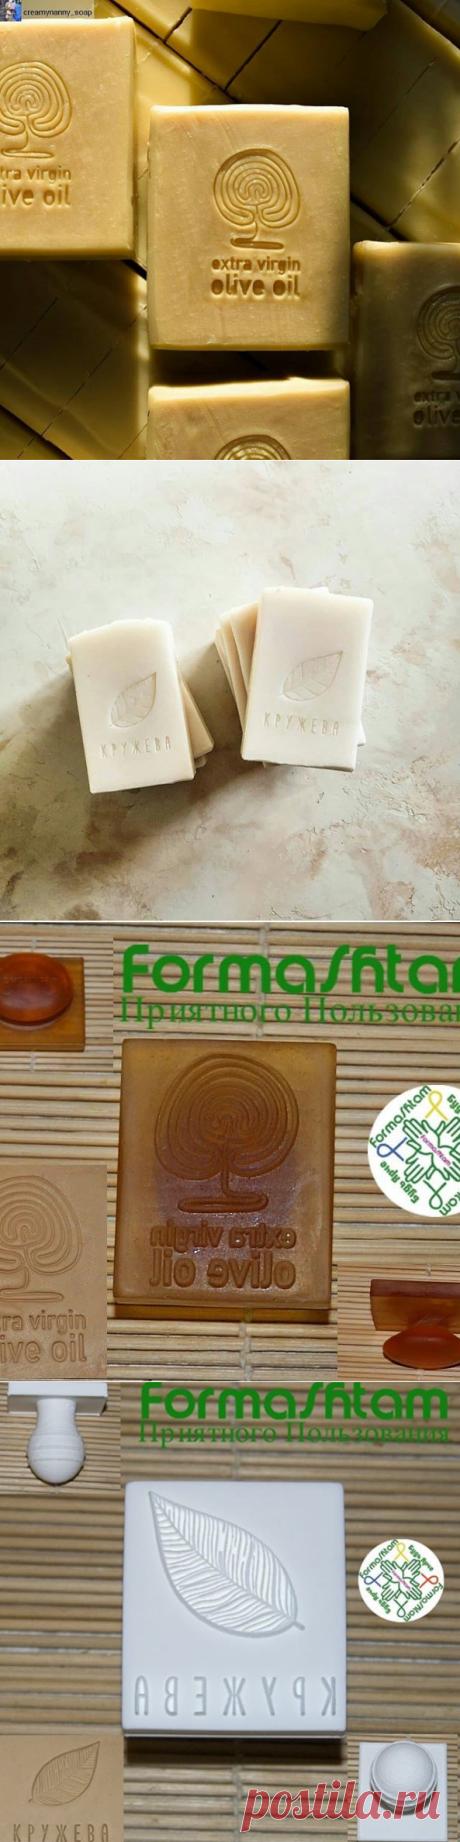 FORMASHTAM (@formashtam) • Фото и видео в Instagram